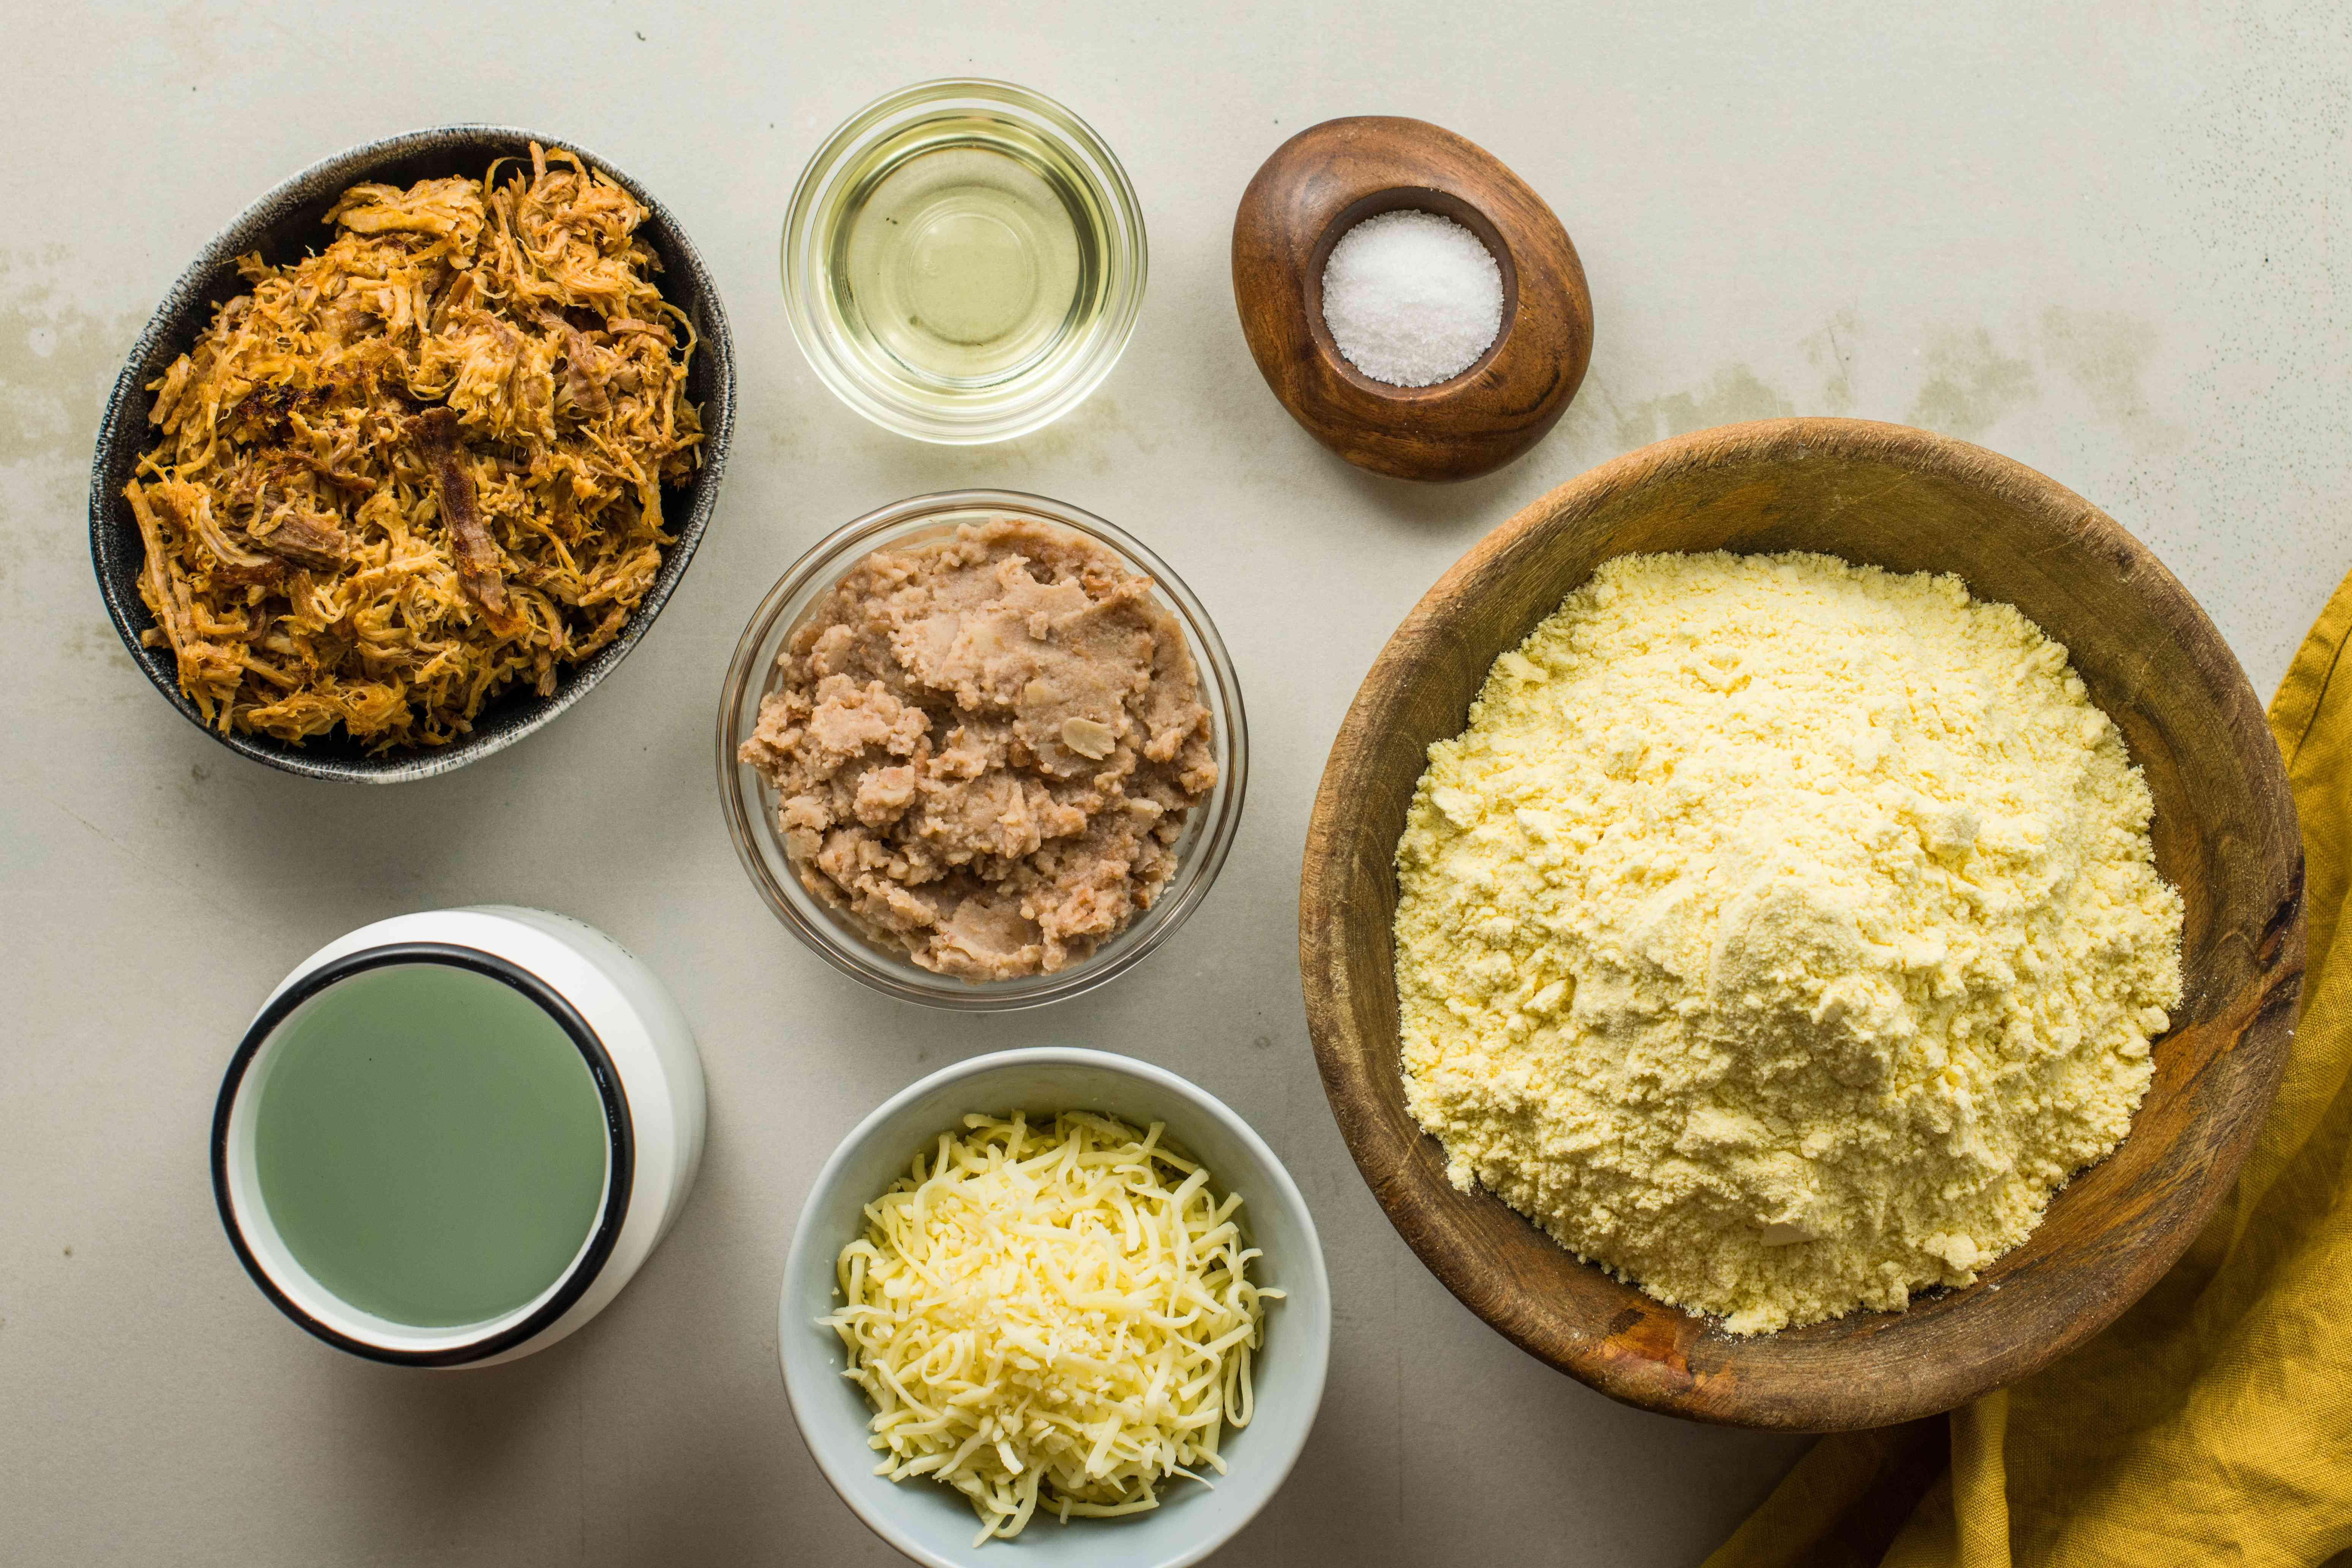 Ingredients for papusas